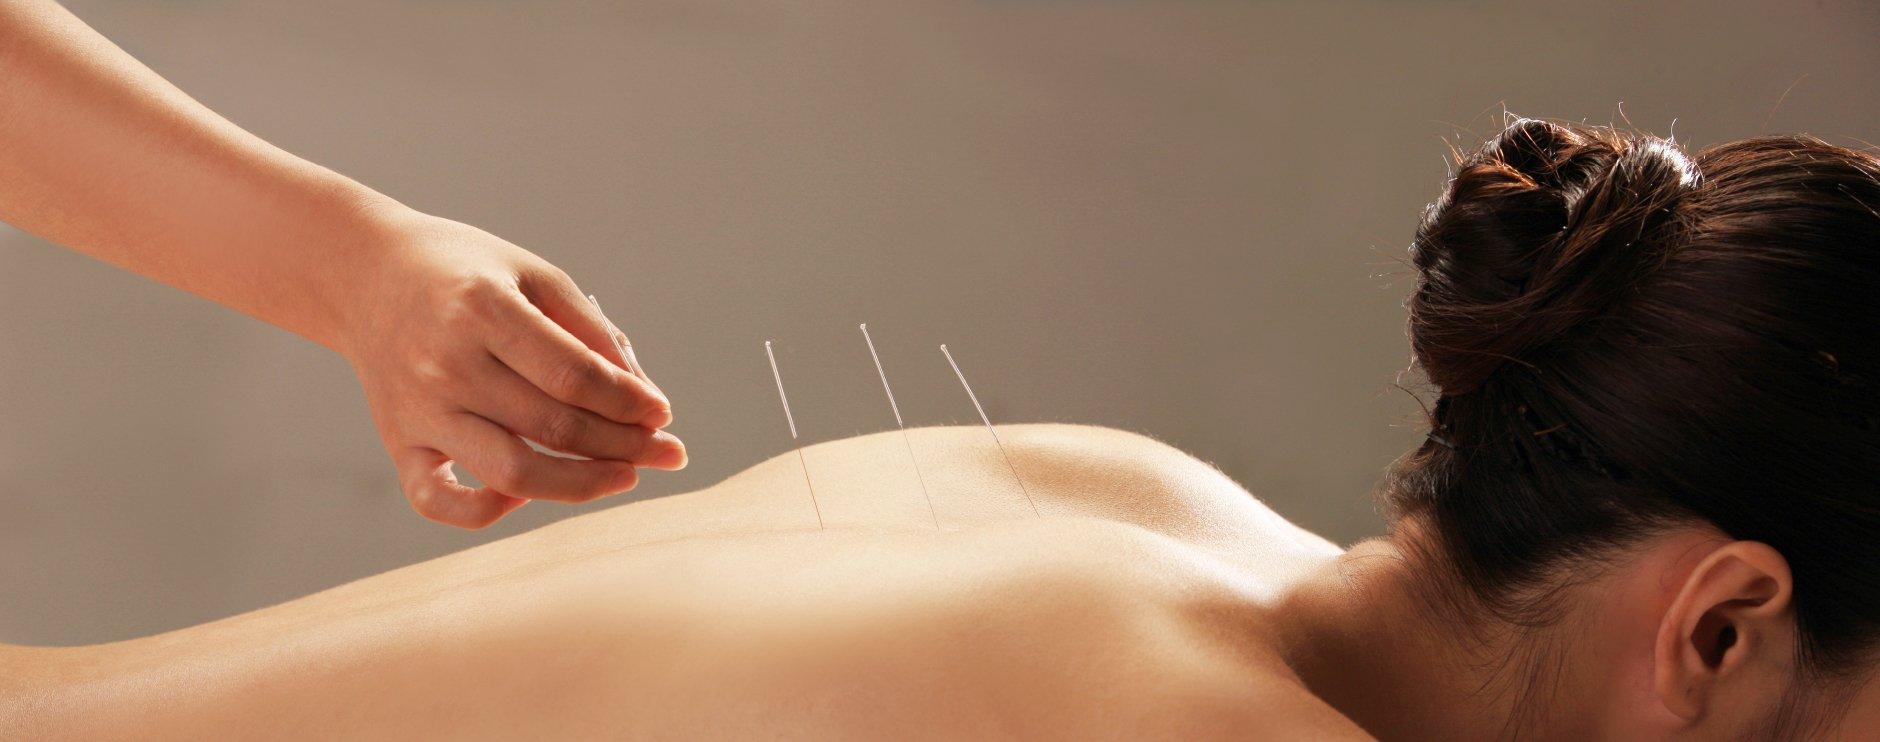 Medicina Tradicional Chinesa/Acupunctura